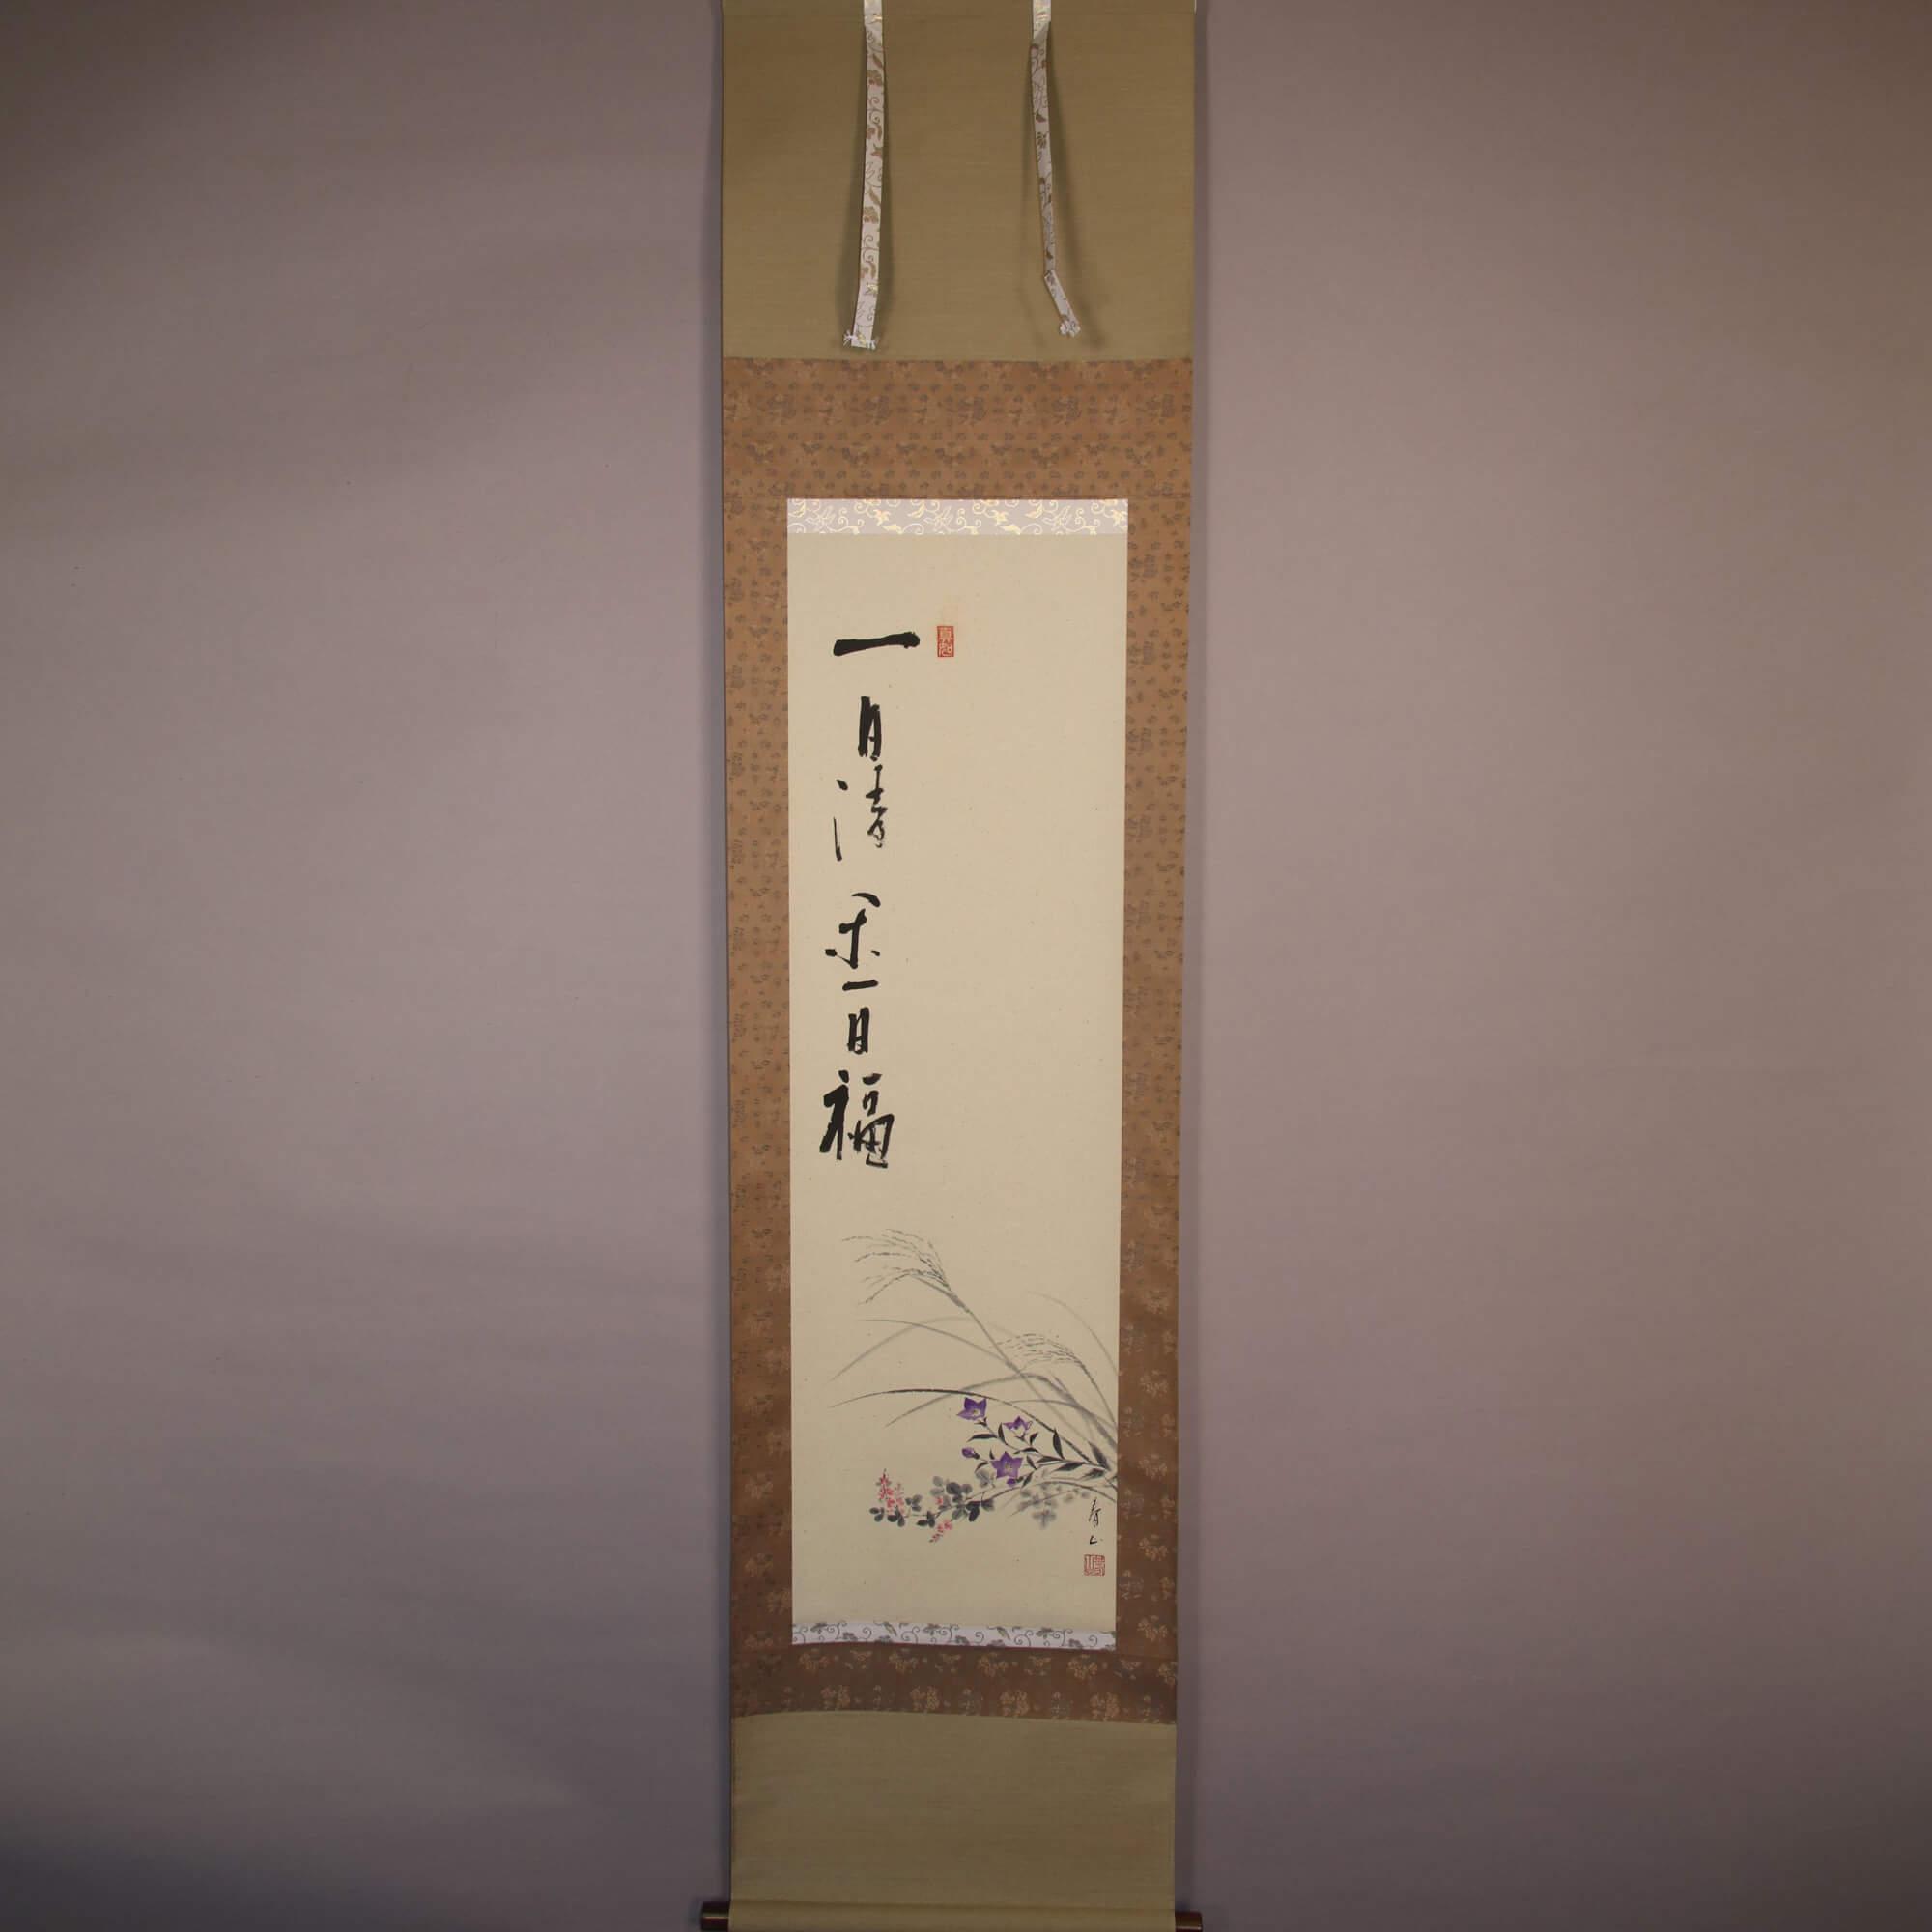 Bush Clover & Chinese Bellflower / Ibaraki Shunzan